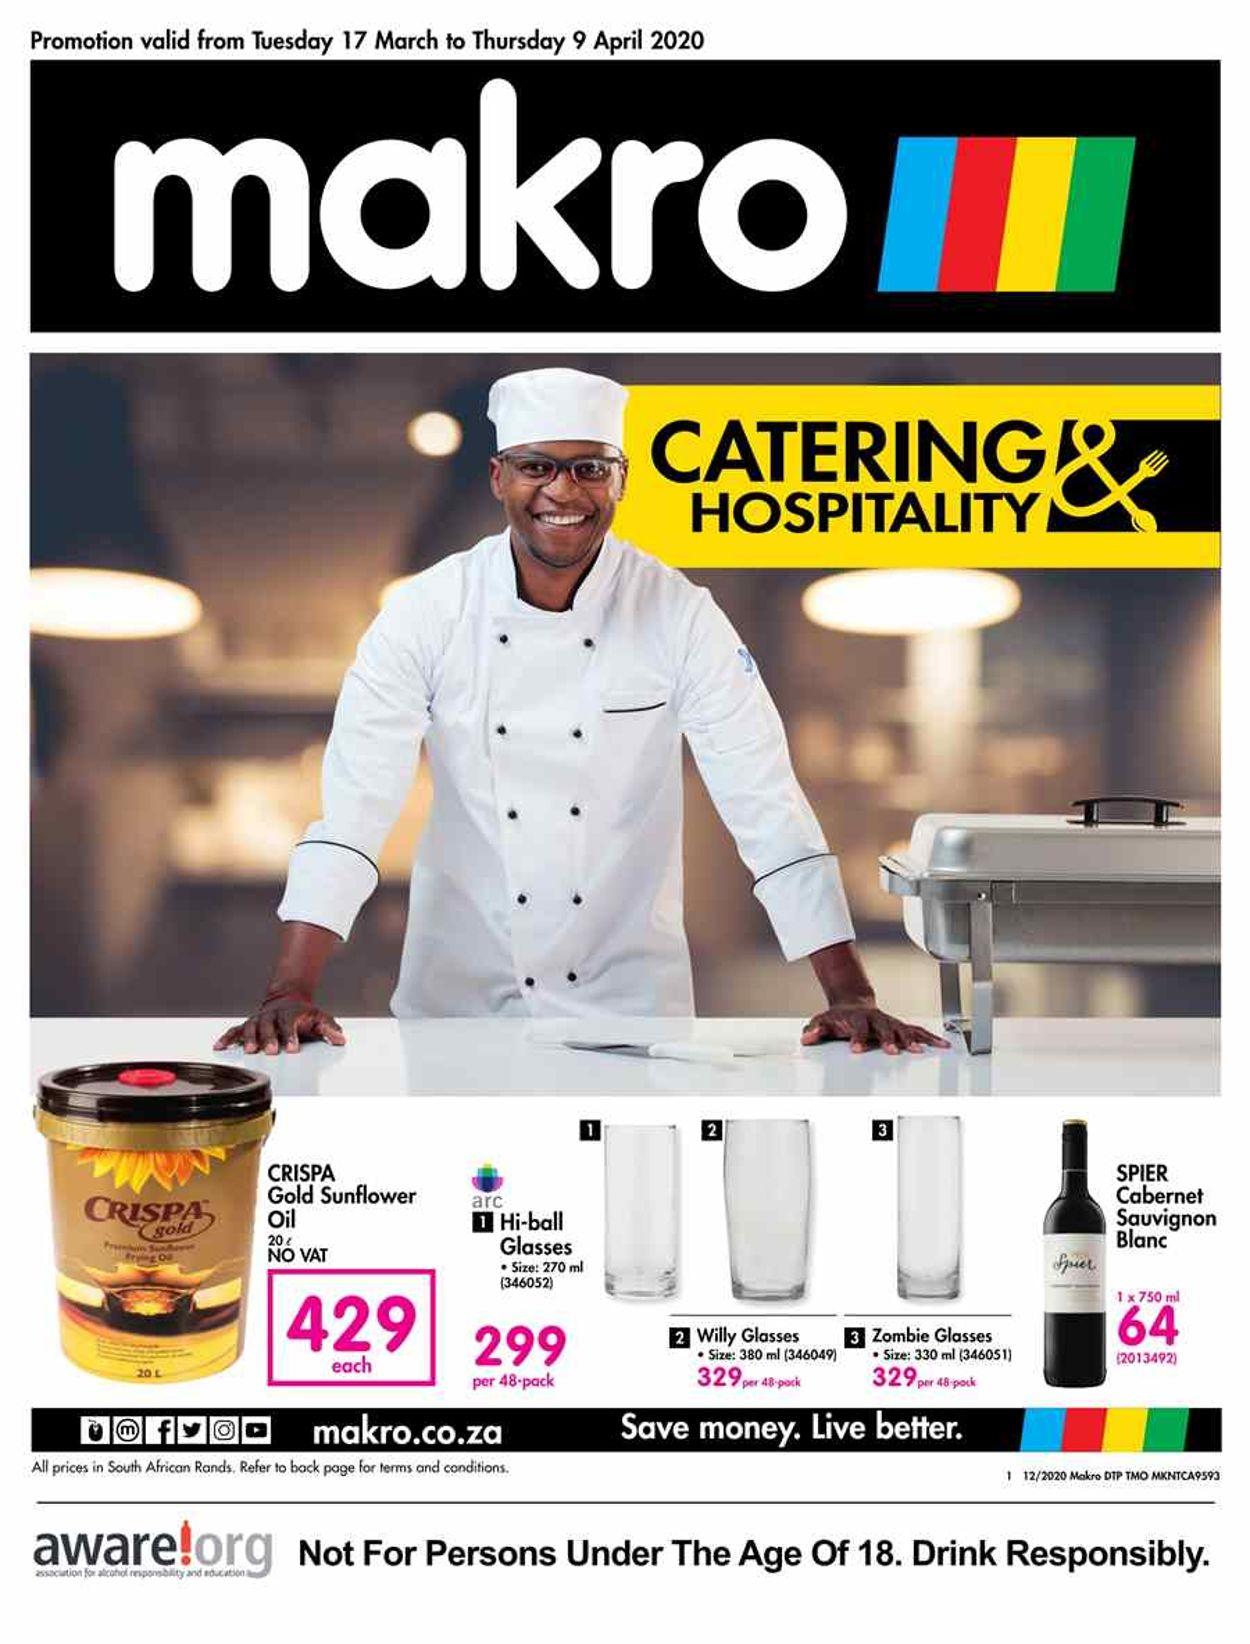 Makro Catalogue - 2020/03/17-2020/04/09